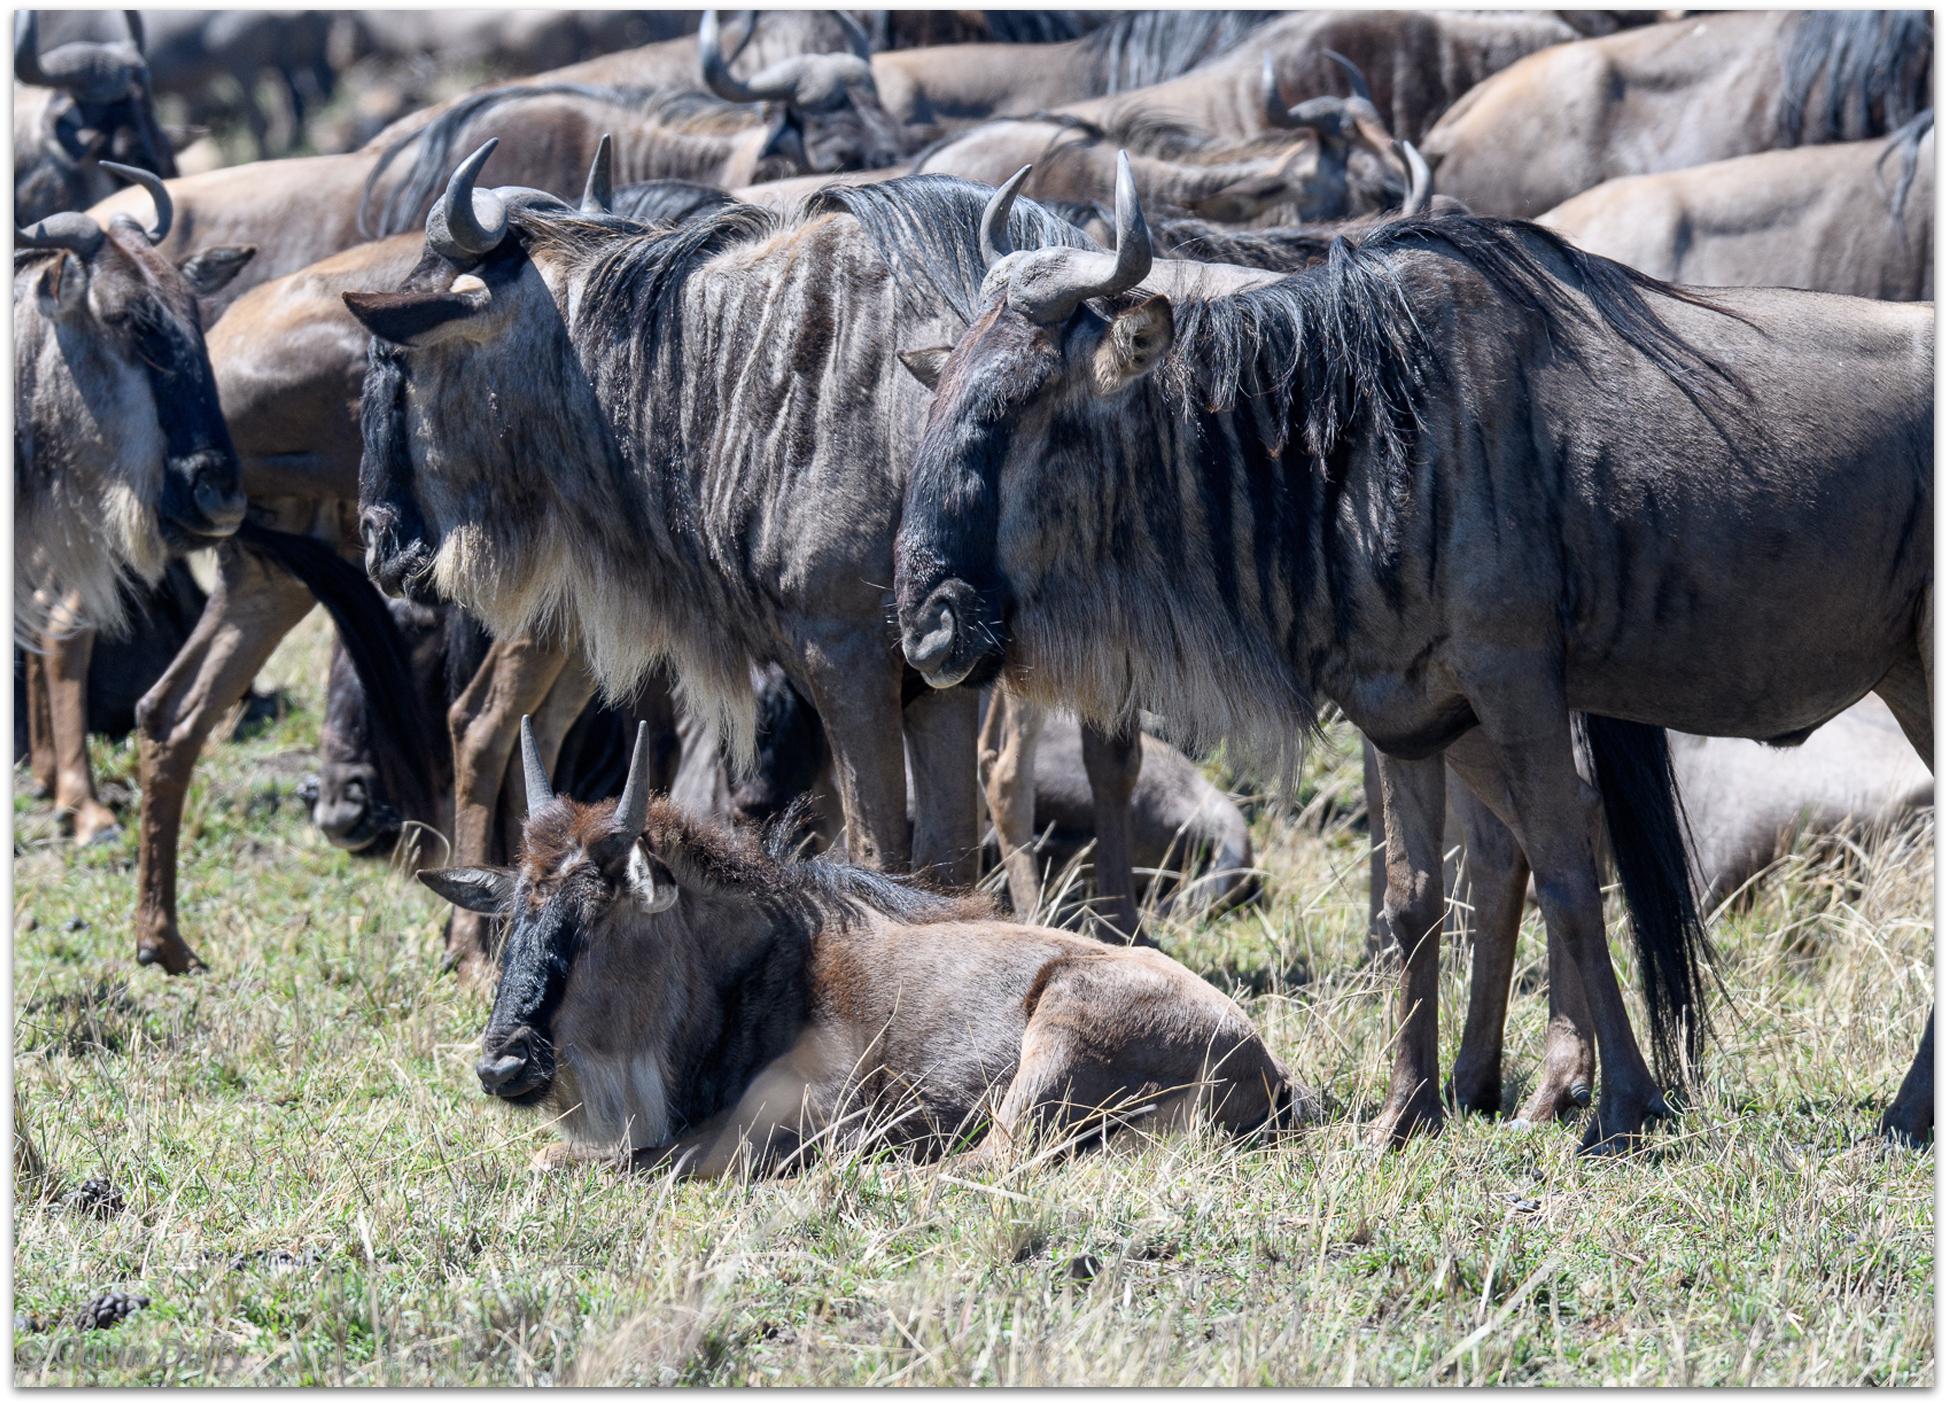 A wildebeest calf rests © Gavin Duffy